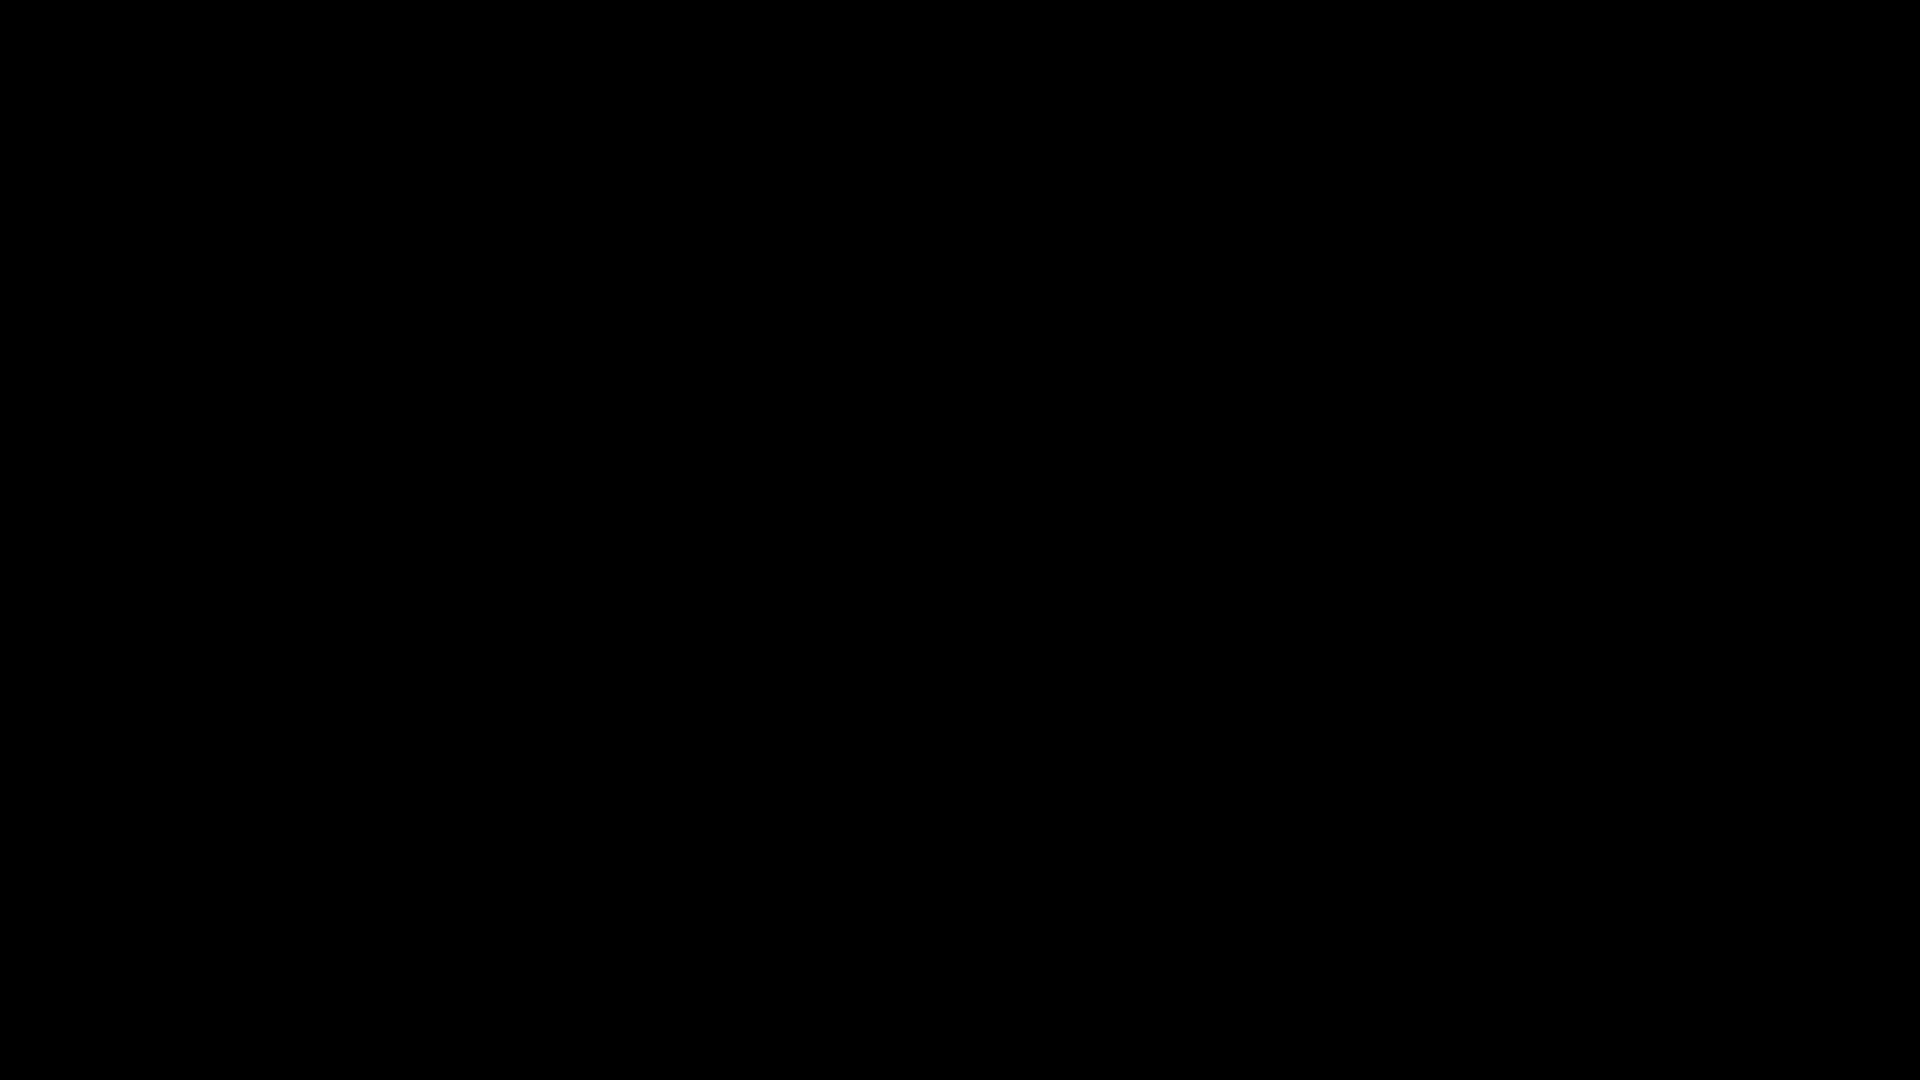 Audio, Audio Engineer, Dave Pensado, Dave Pensado (Person), Engineer (Profession), Fl Studio, How To, Into The Lair, Mix, Mixing, Music, Music (TV Genre), Pensado's Place, Pensados Place, Plug In, Pro Tools, Record Producer (Profession), Recording, Recording Studio, Tricks, Producer/Mixer